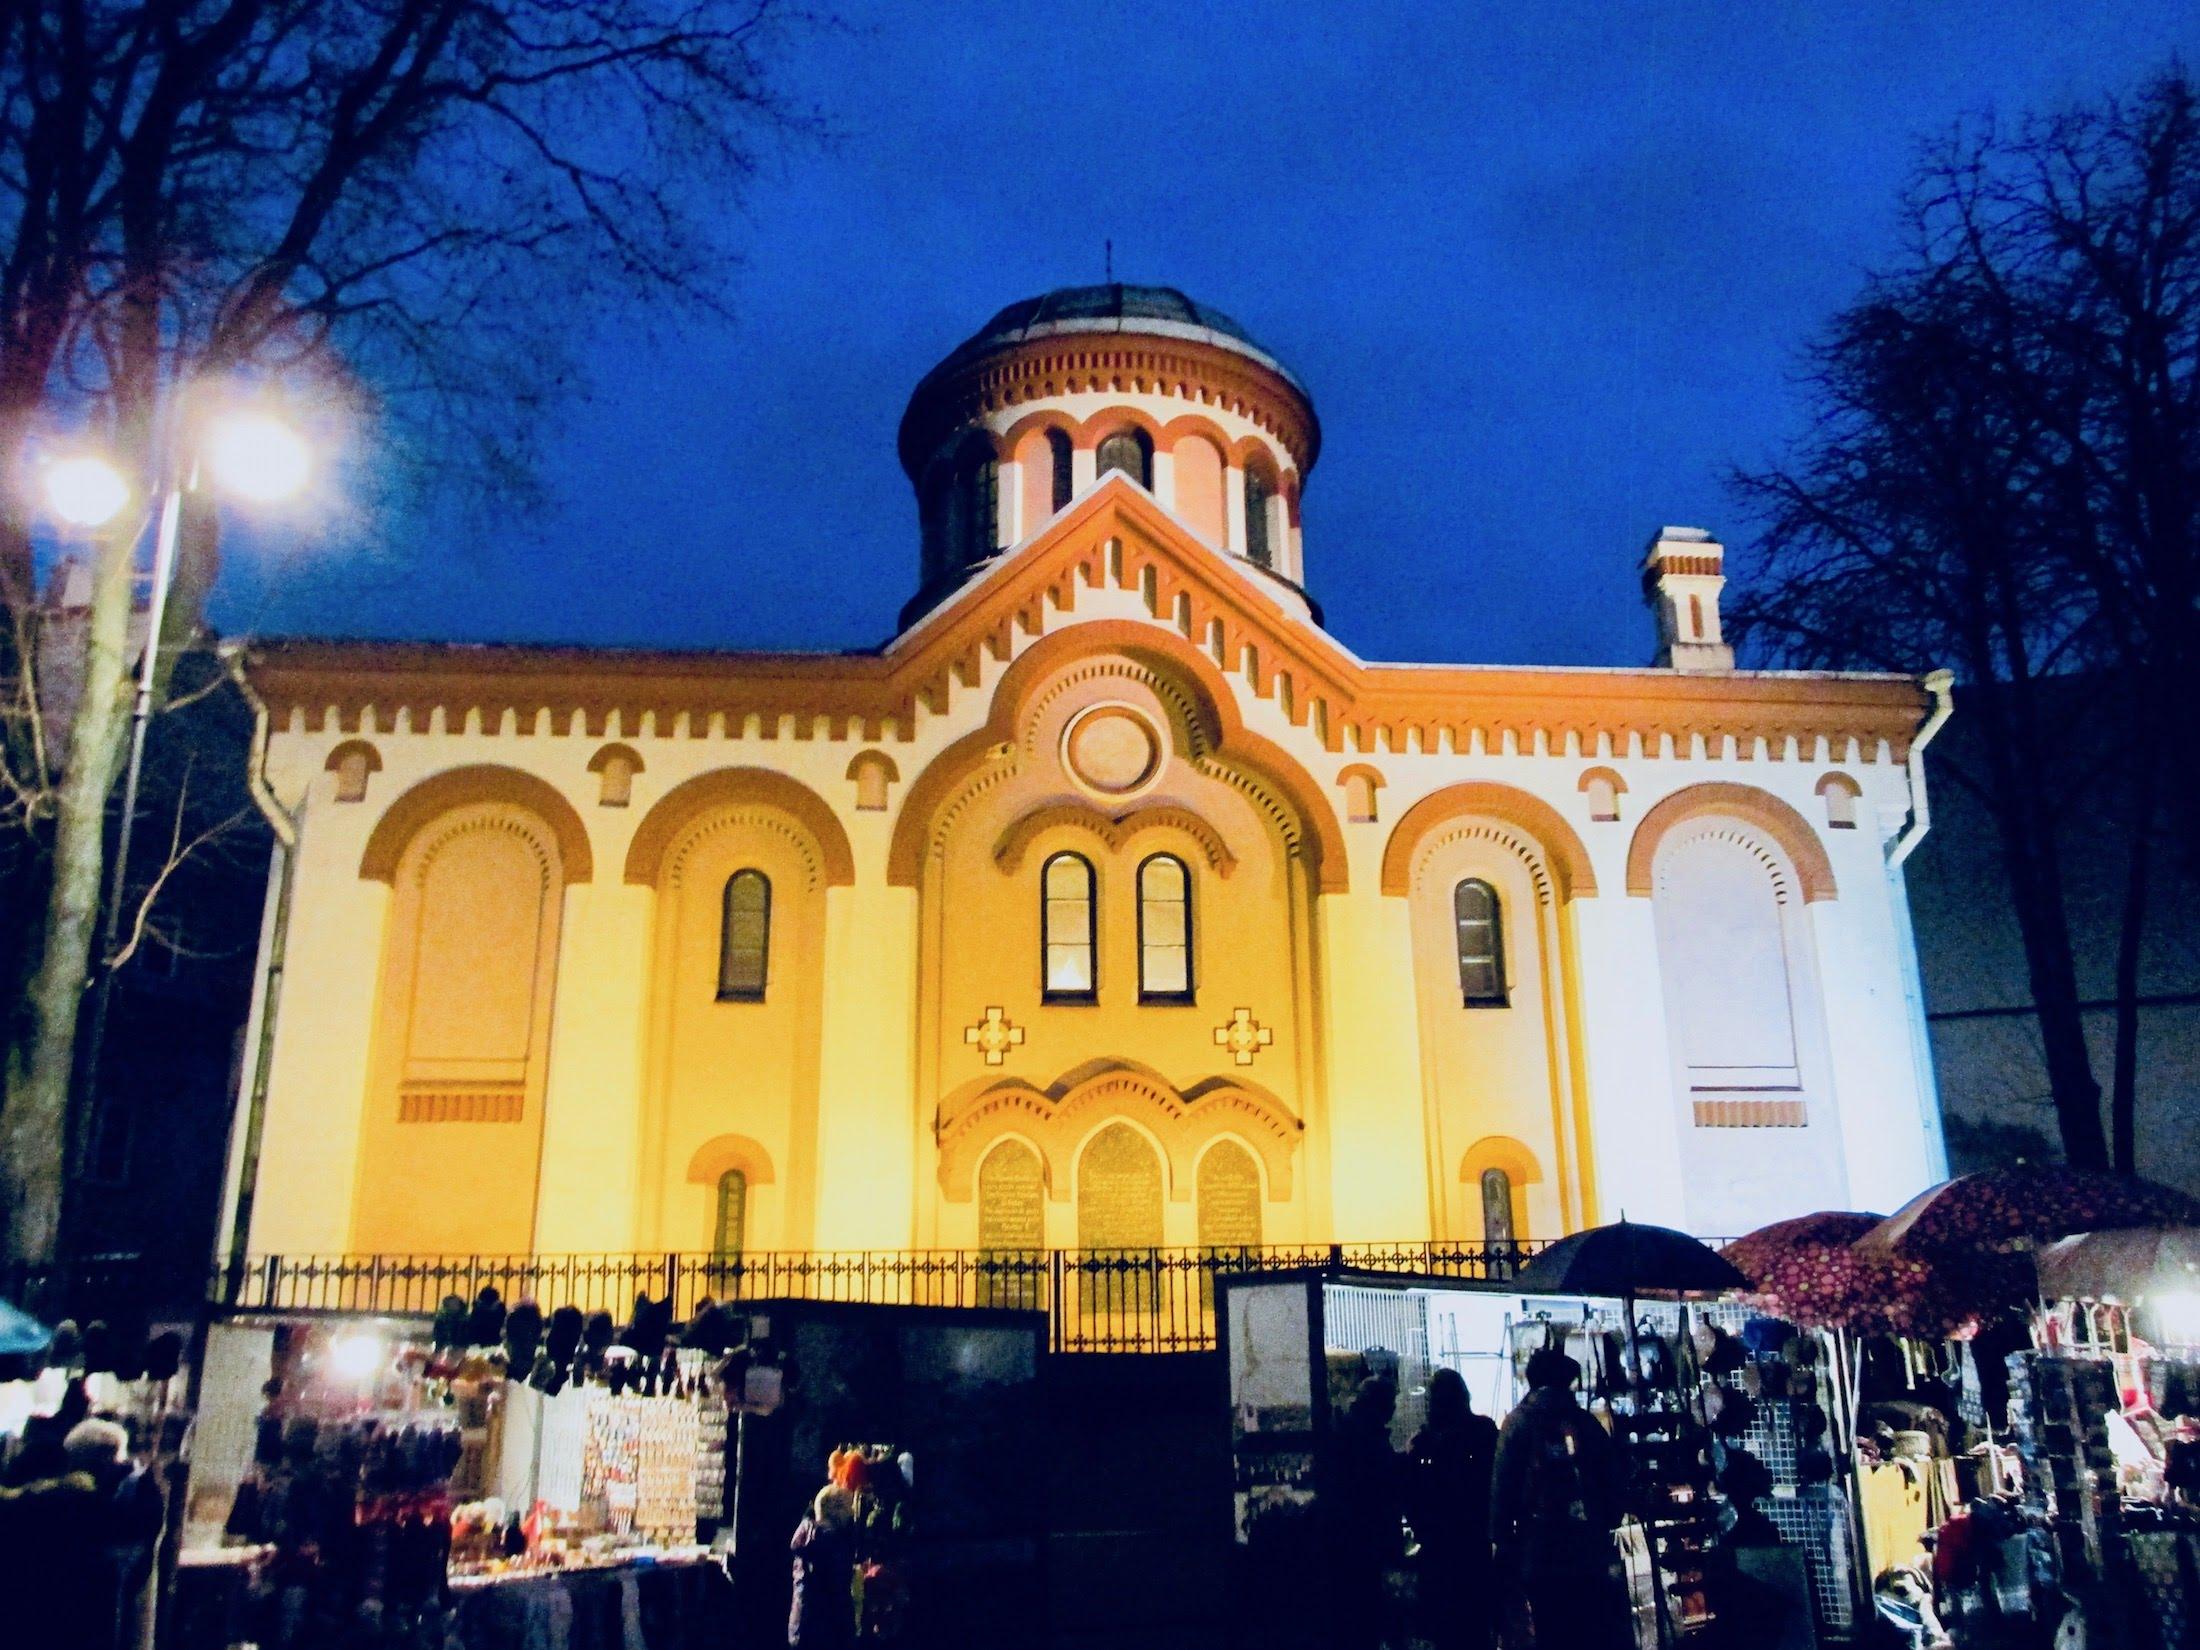 Beautifully enlightened church building